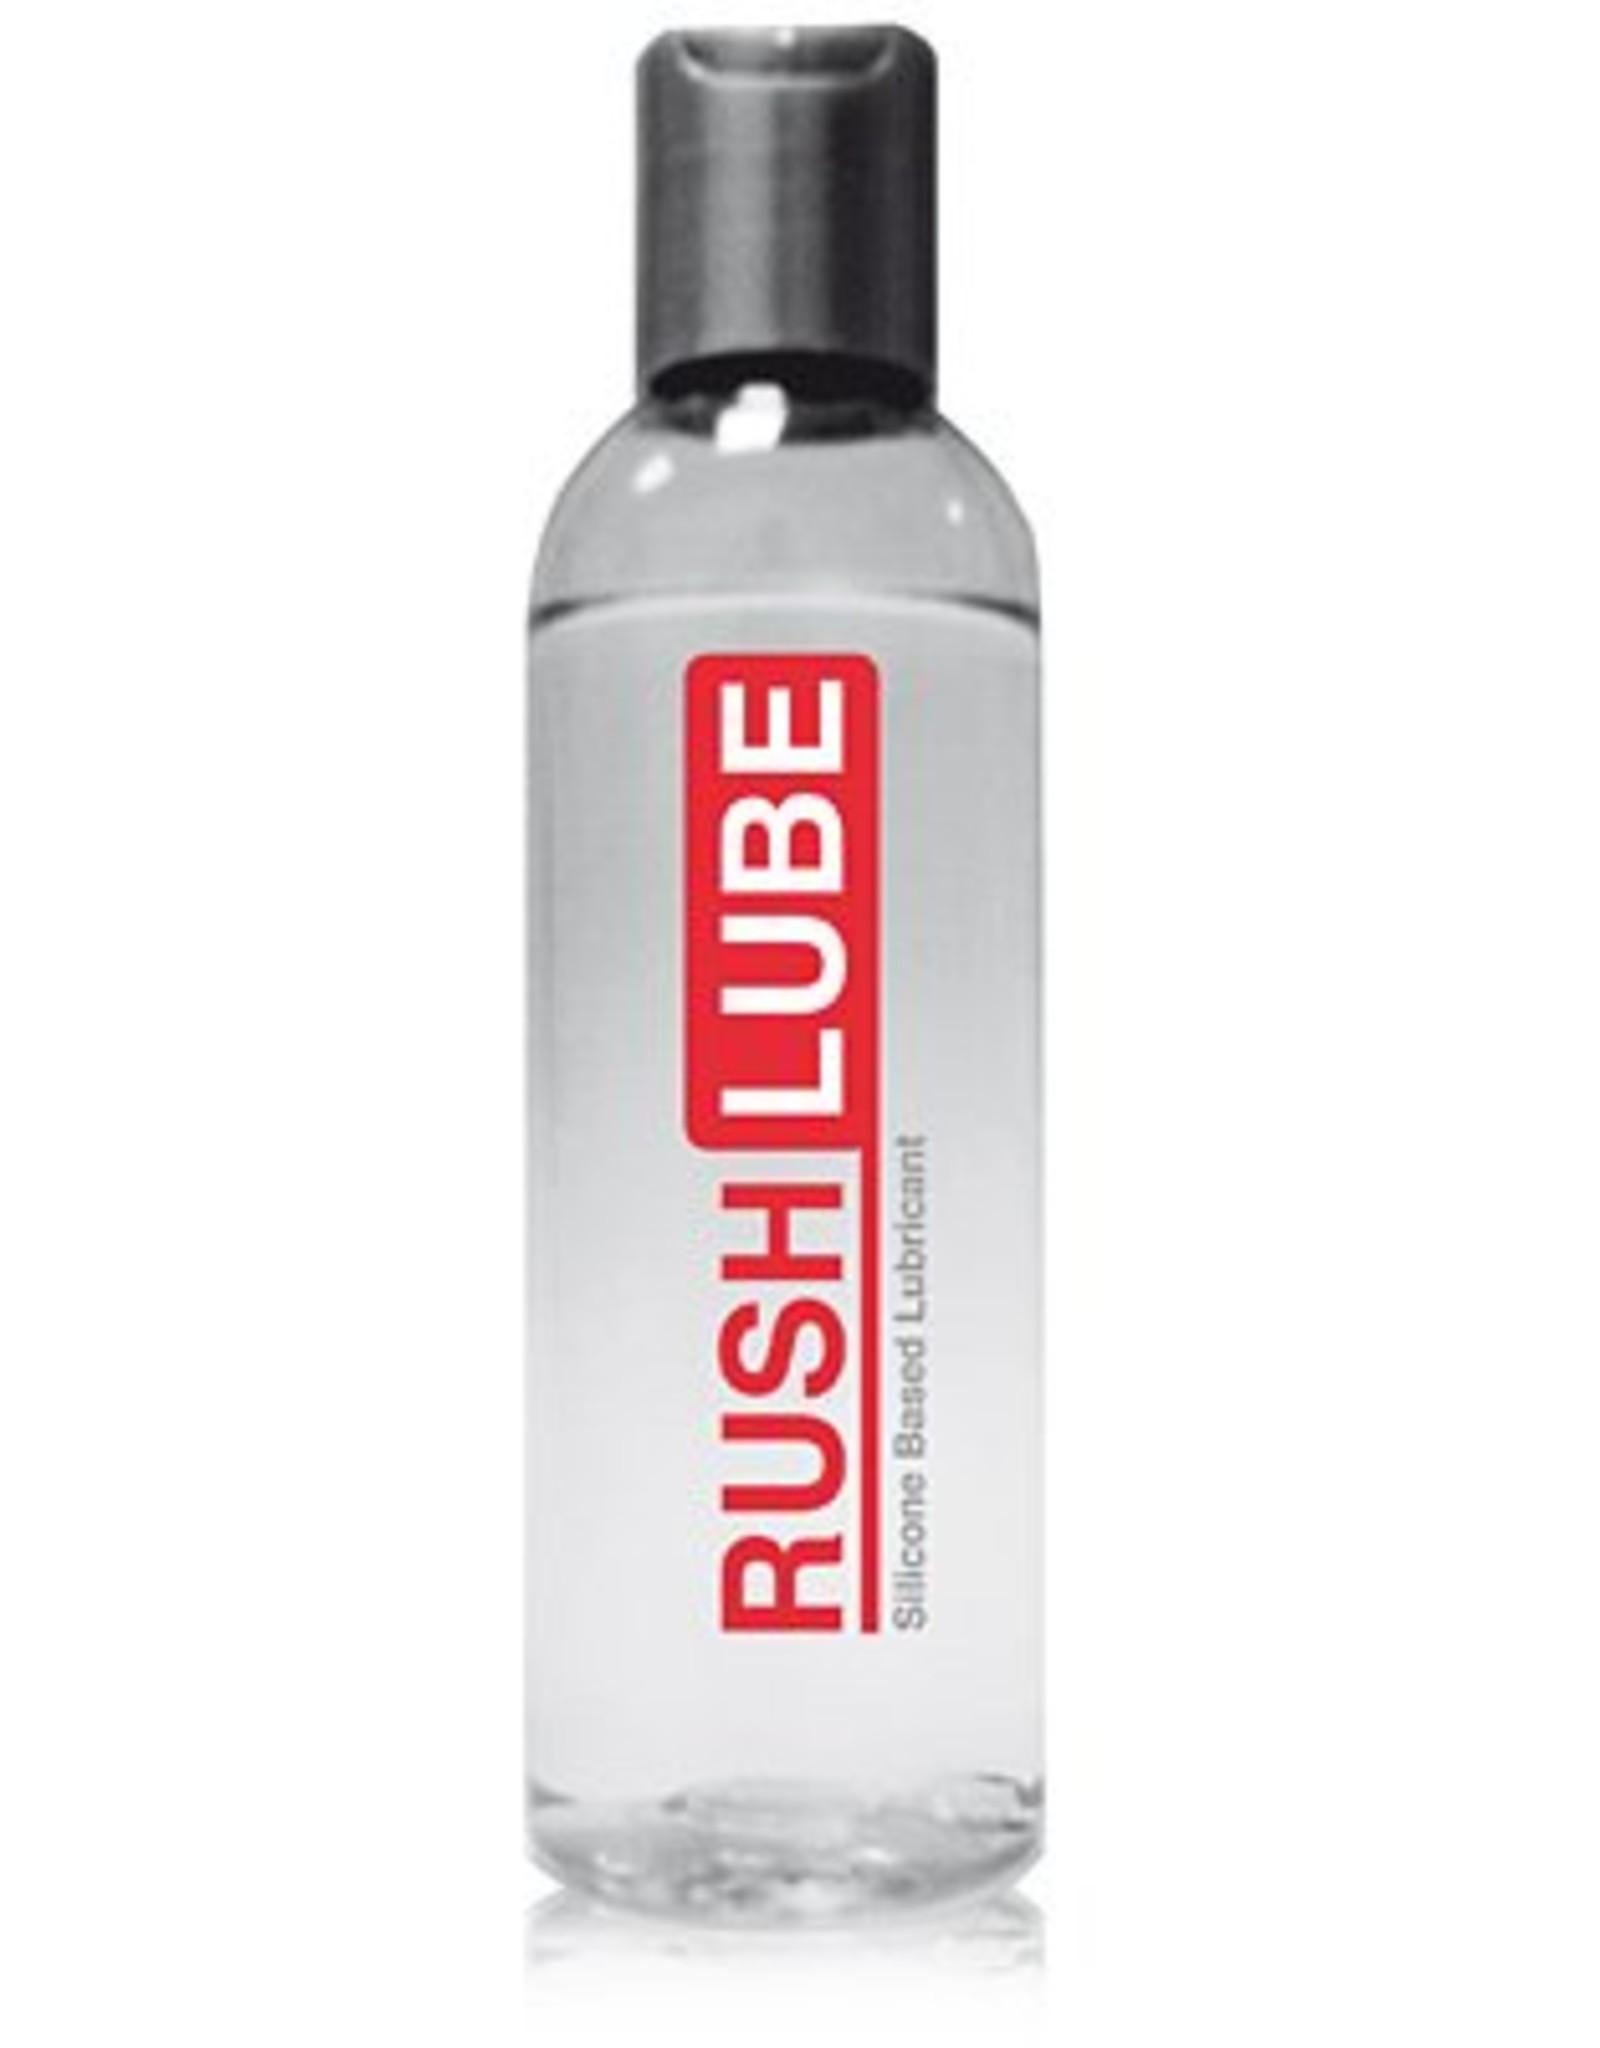 Rush Lube lubrifiant (silicone) 100 ml